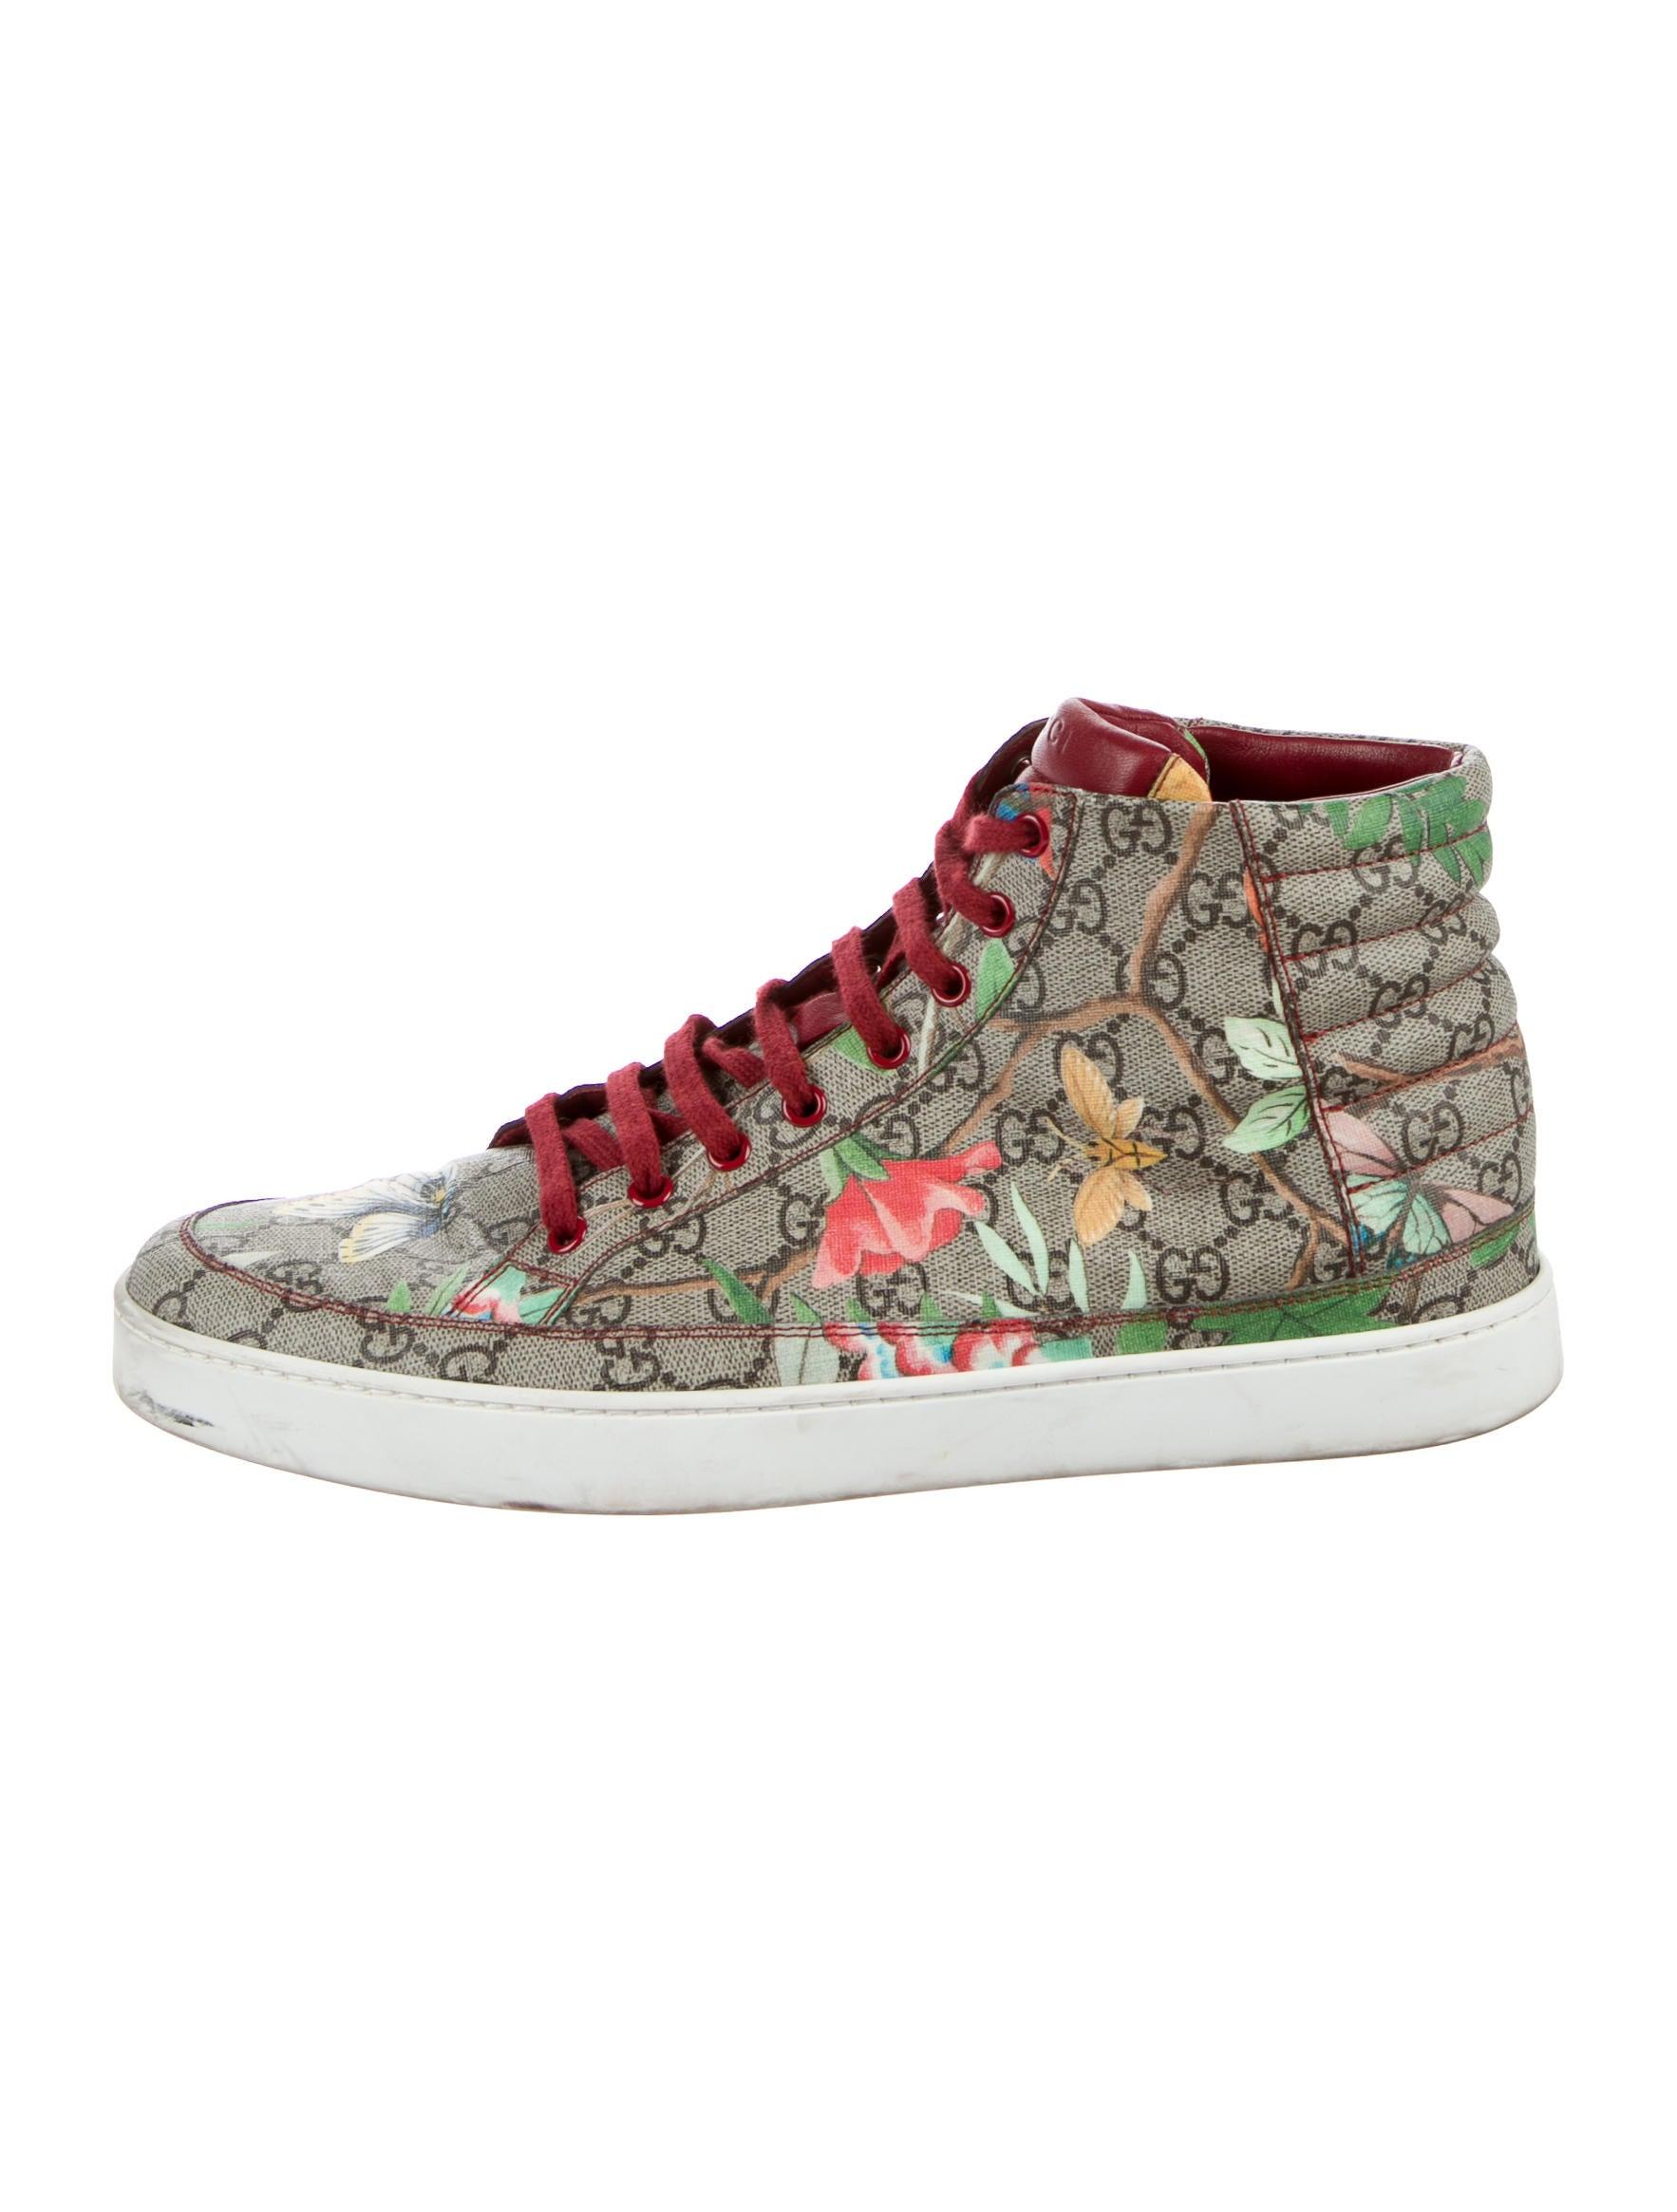 f036b19d97b Gucci Tian High-Top Sneakers - Shoes - GUC181863